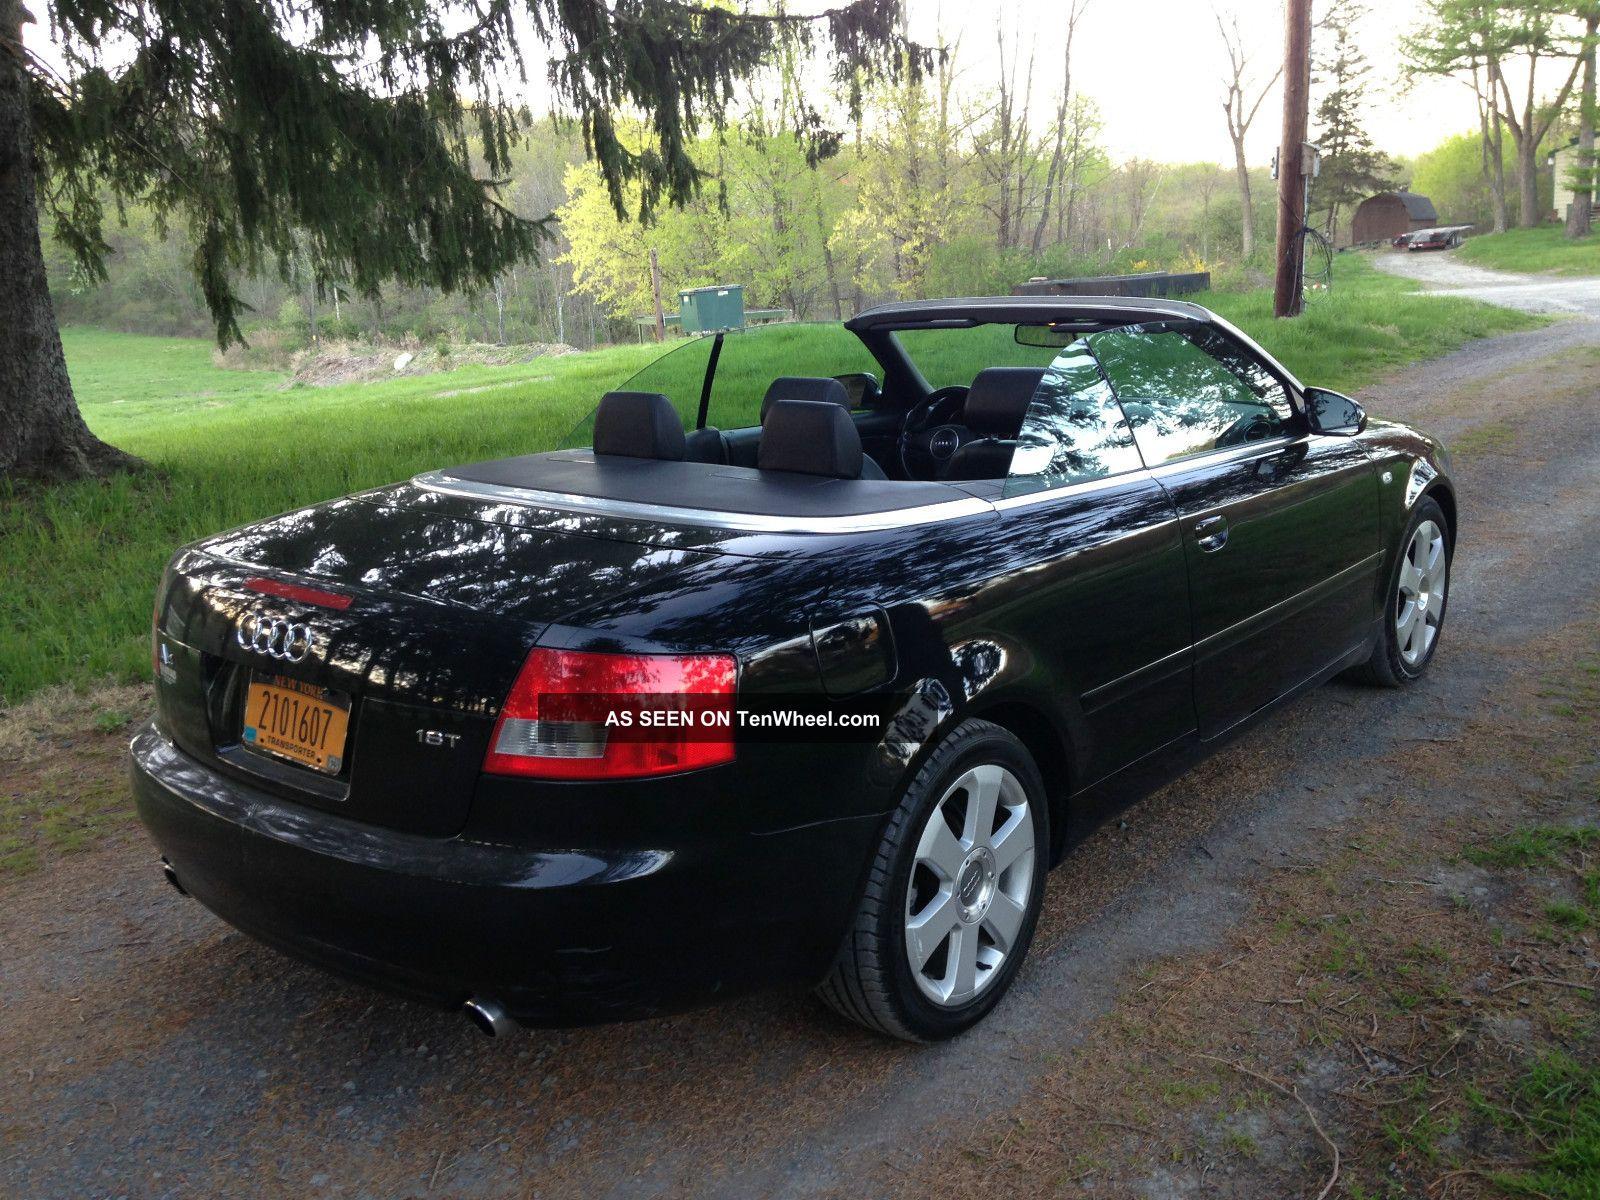 2003 audi a4 cabriolet convertible 2 door 1 8t black on black cvt tranny. Black Bedroom Furniture Sets. Home Design Ideas